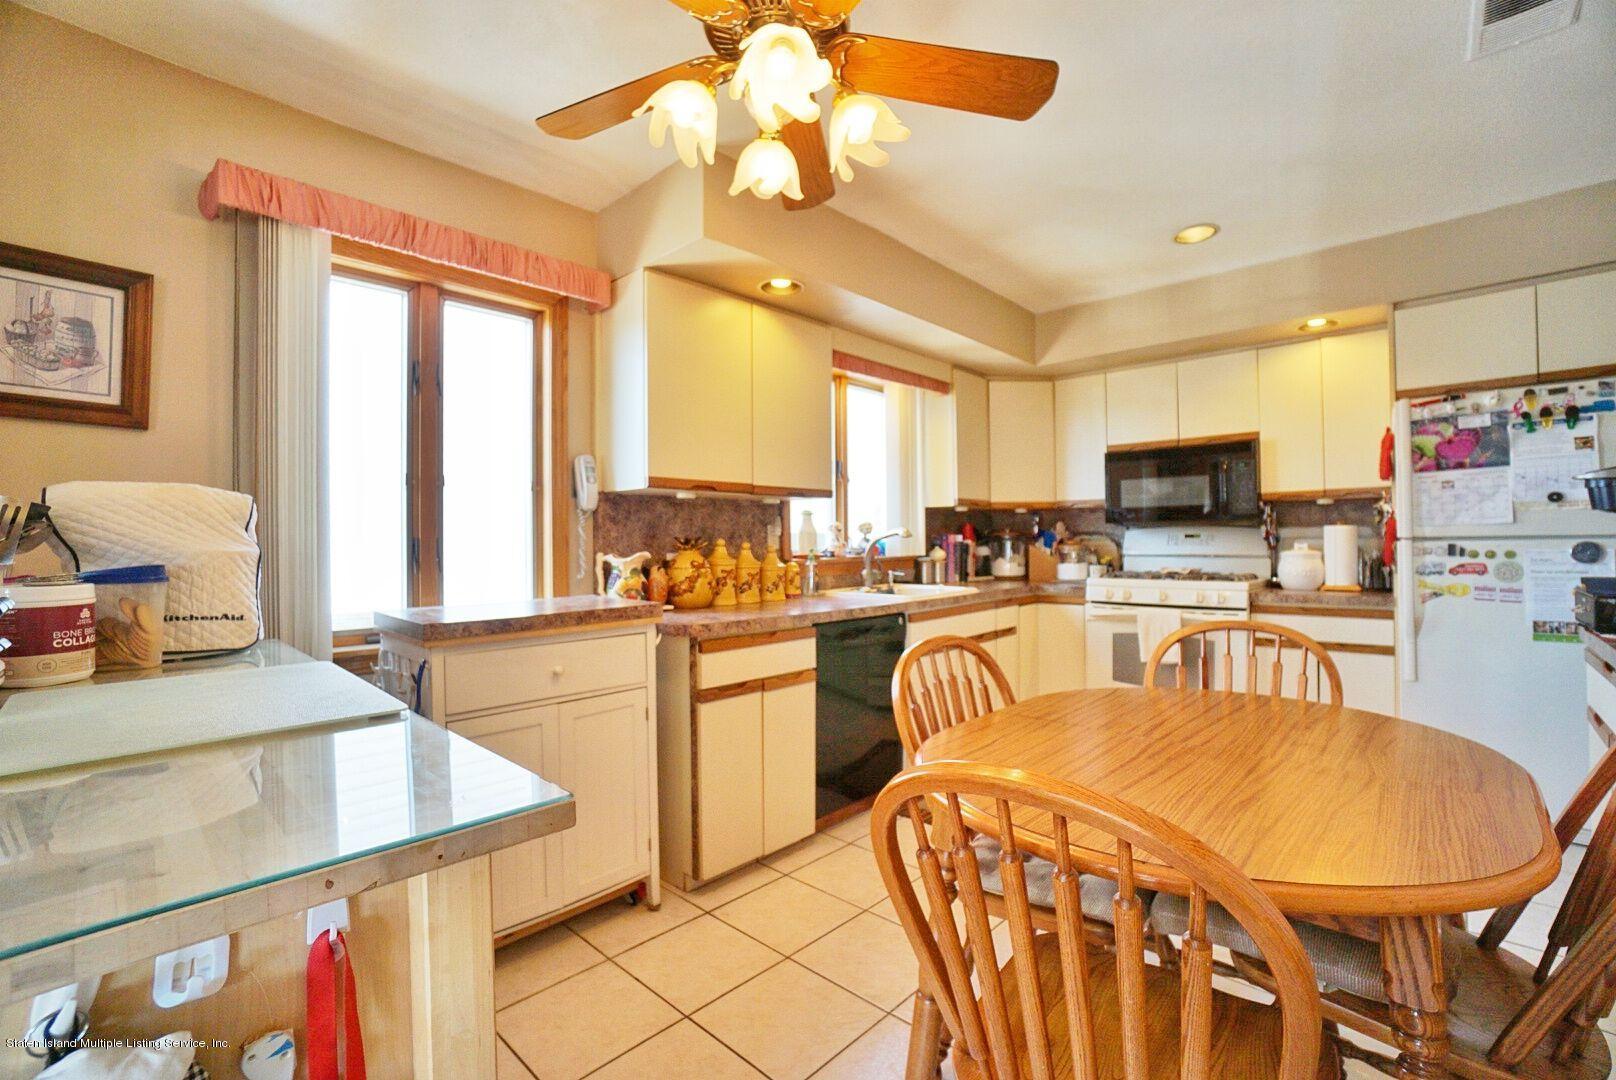 Single Family - Detached 283 Holdridge Avenue  Staten Island, NY 10312, MLS-1130000-21